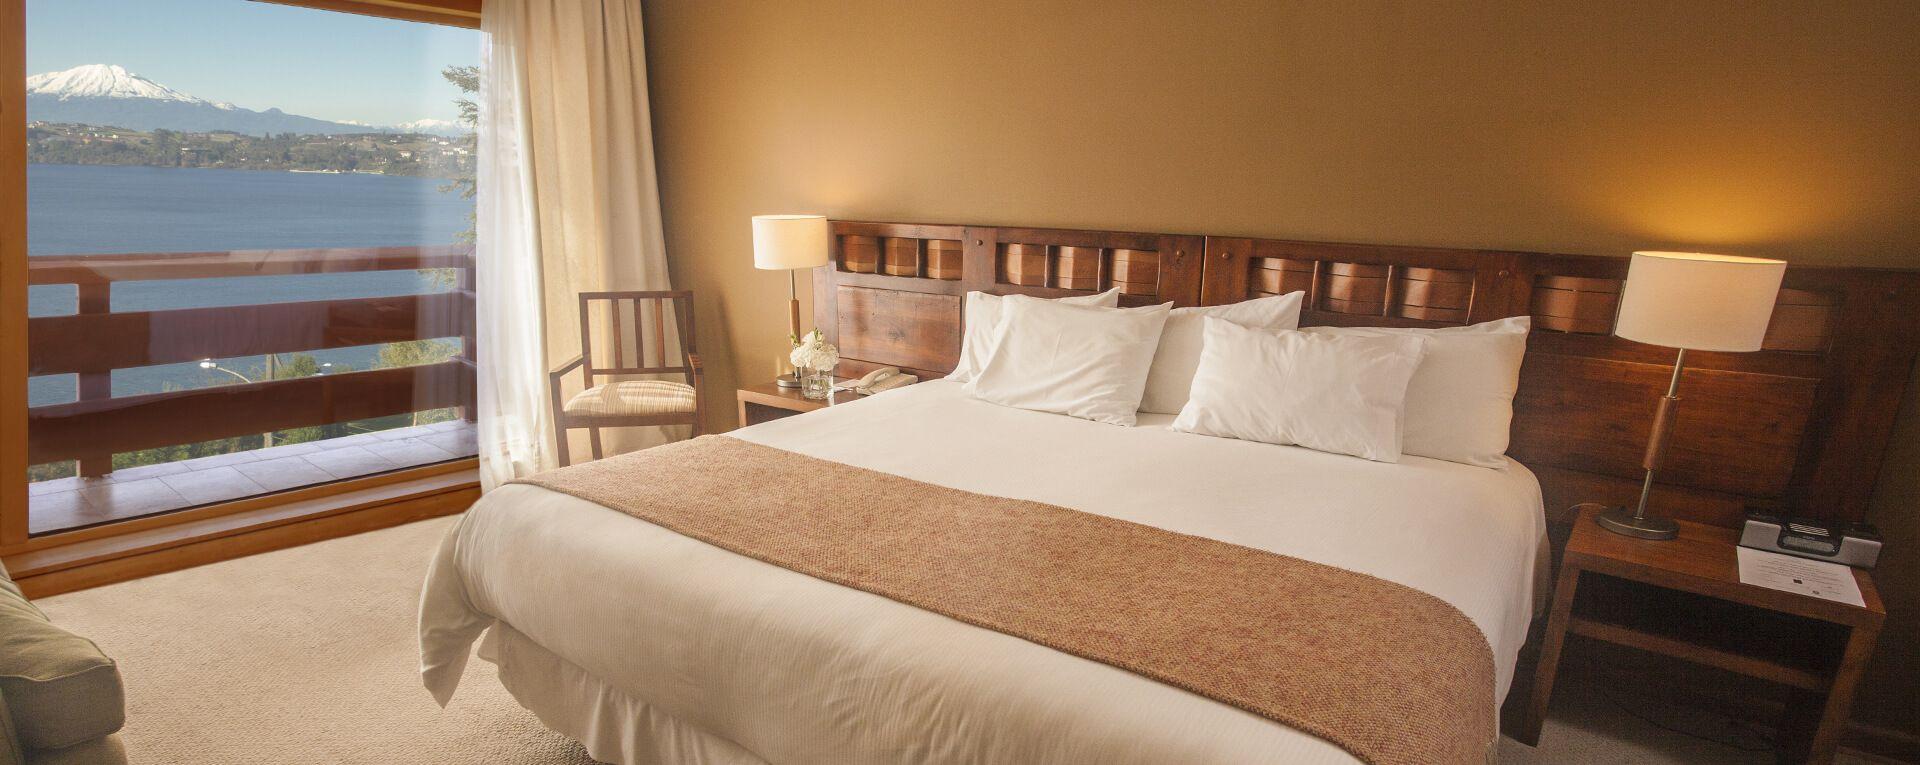 Cumbres Hotel Puerto Varas